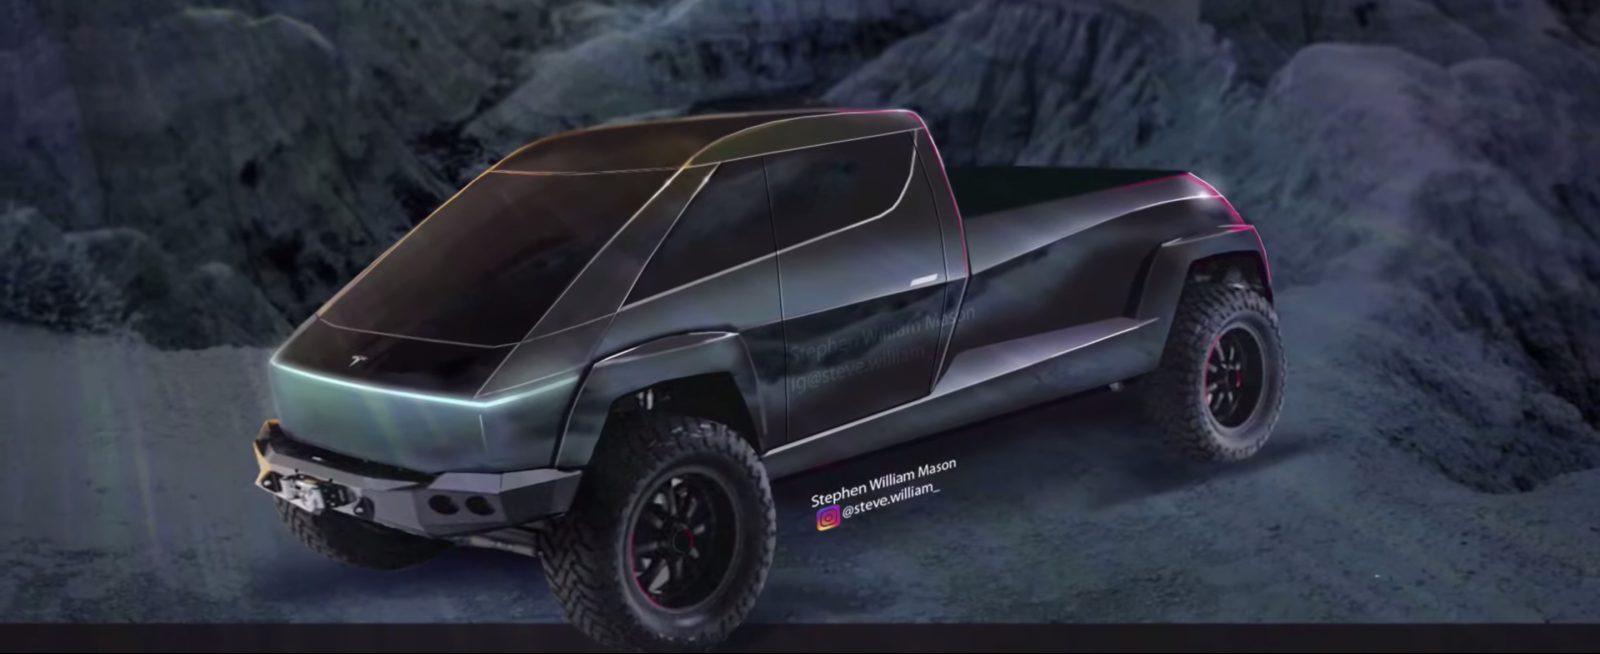 Tesla Pickup truck rendered based on teaser image and comment